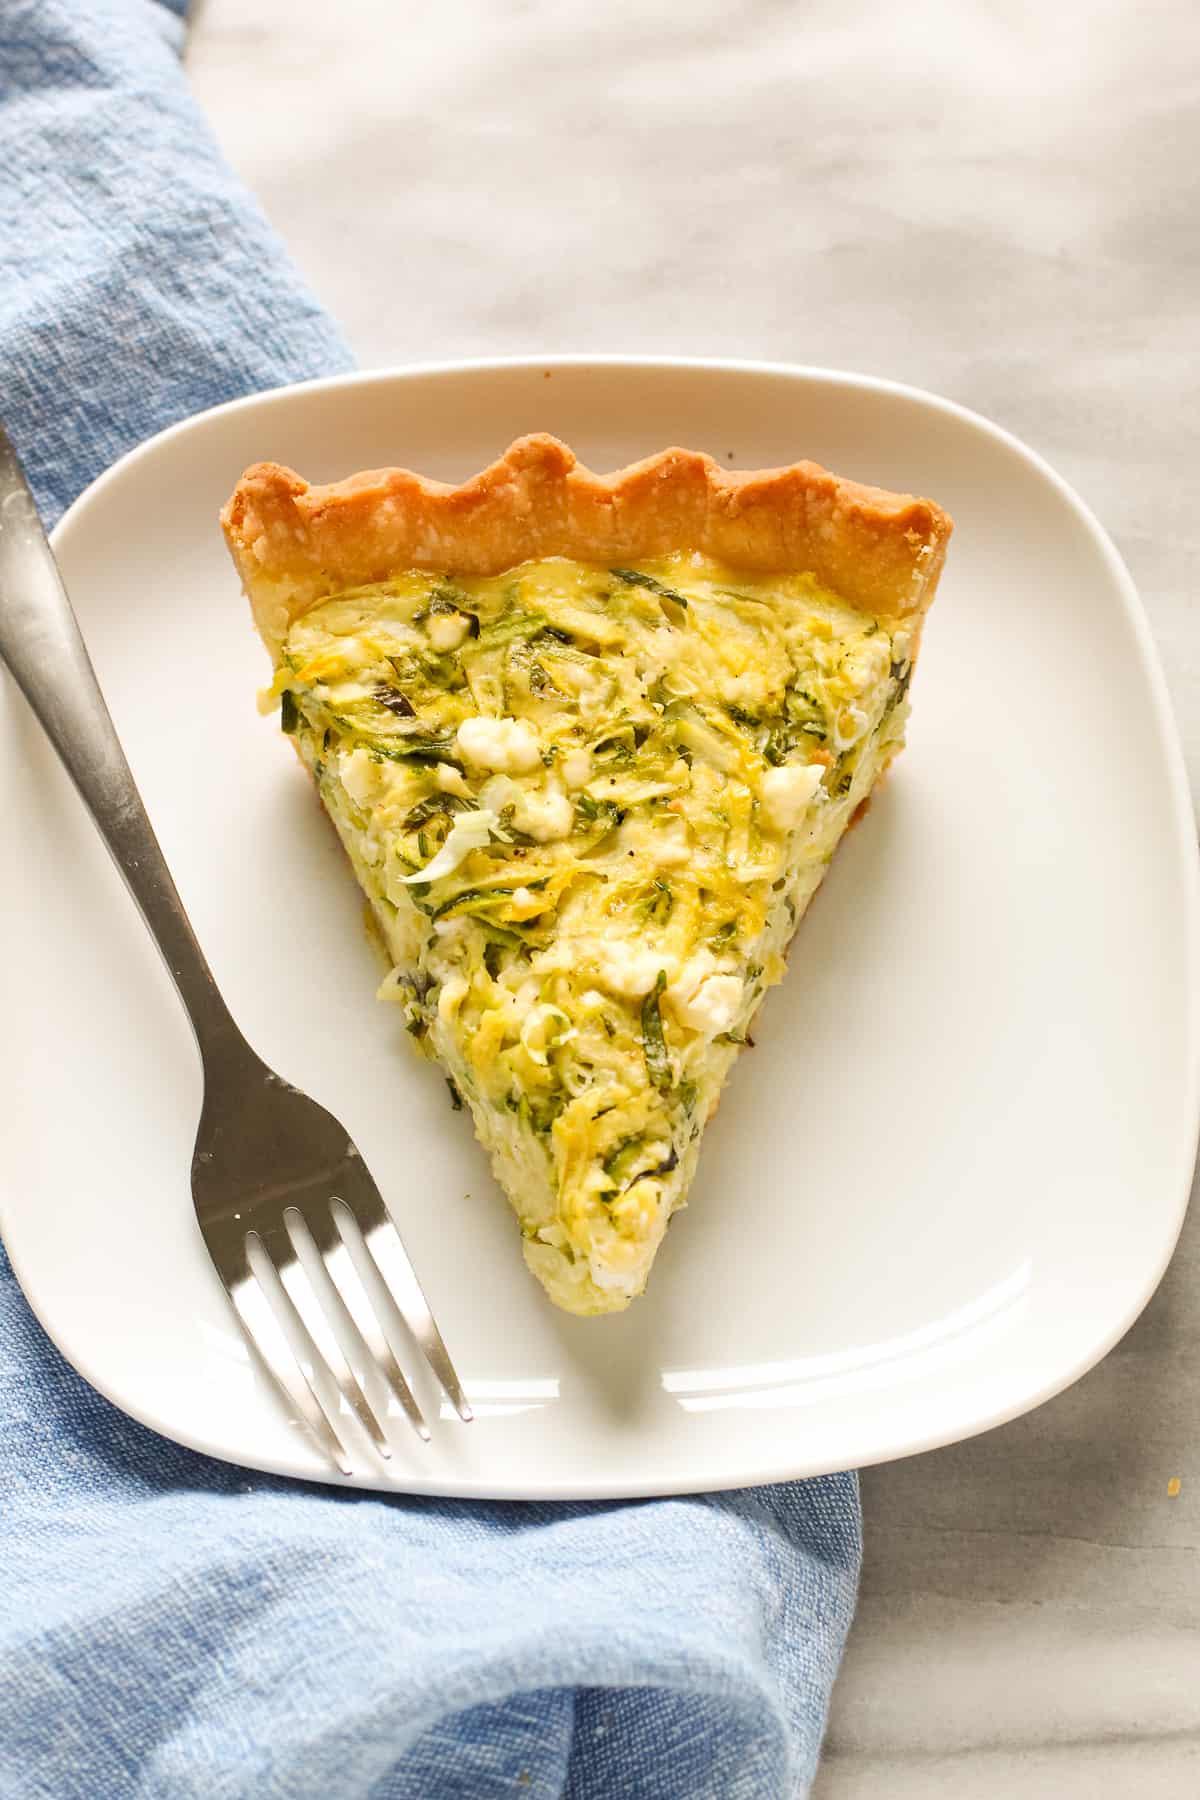 Slice of zucchini pie recipe